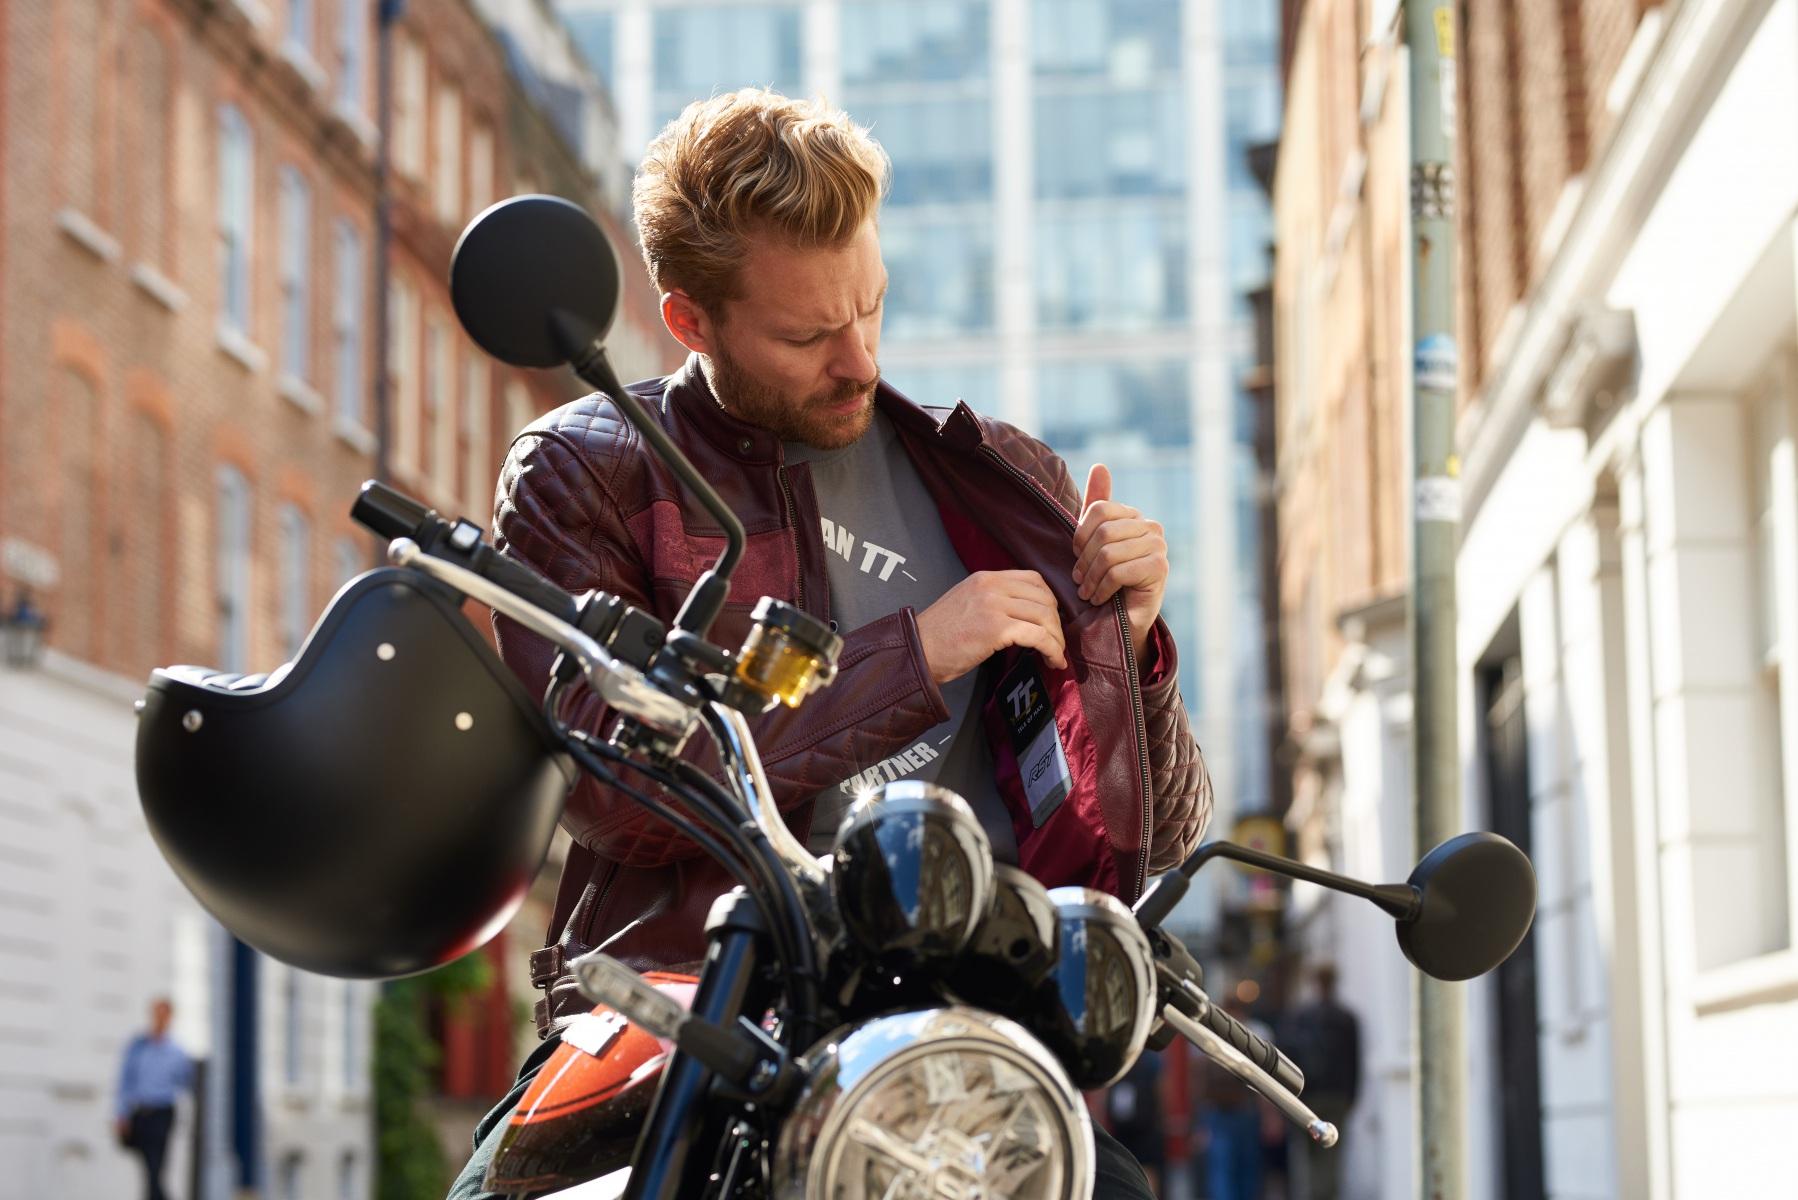 102375-rst-iom-tt-brandish-leather-jacket-oxblood-lifestyle-03